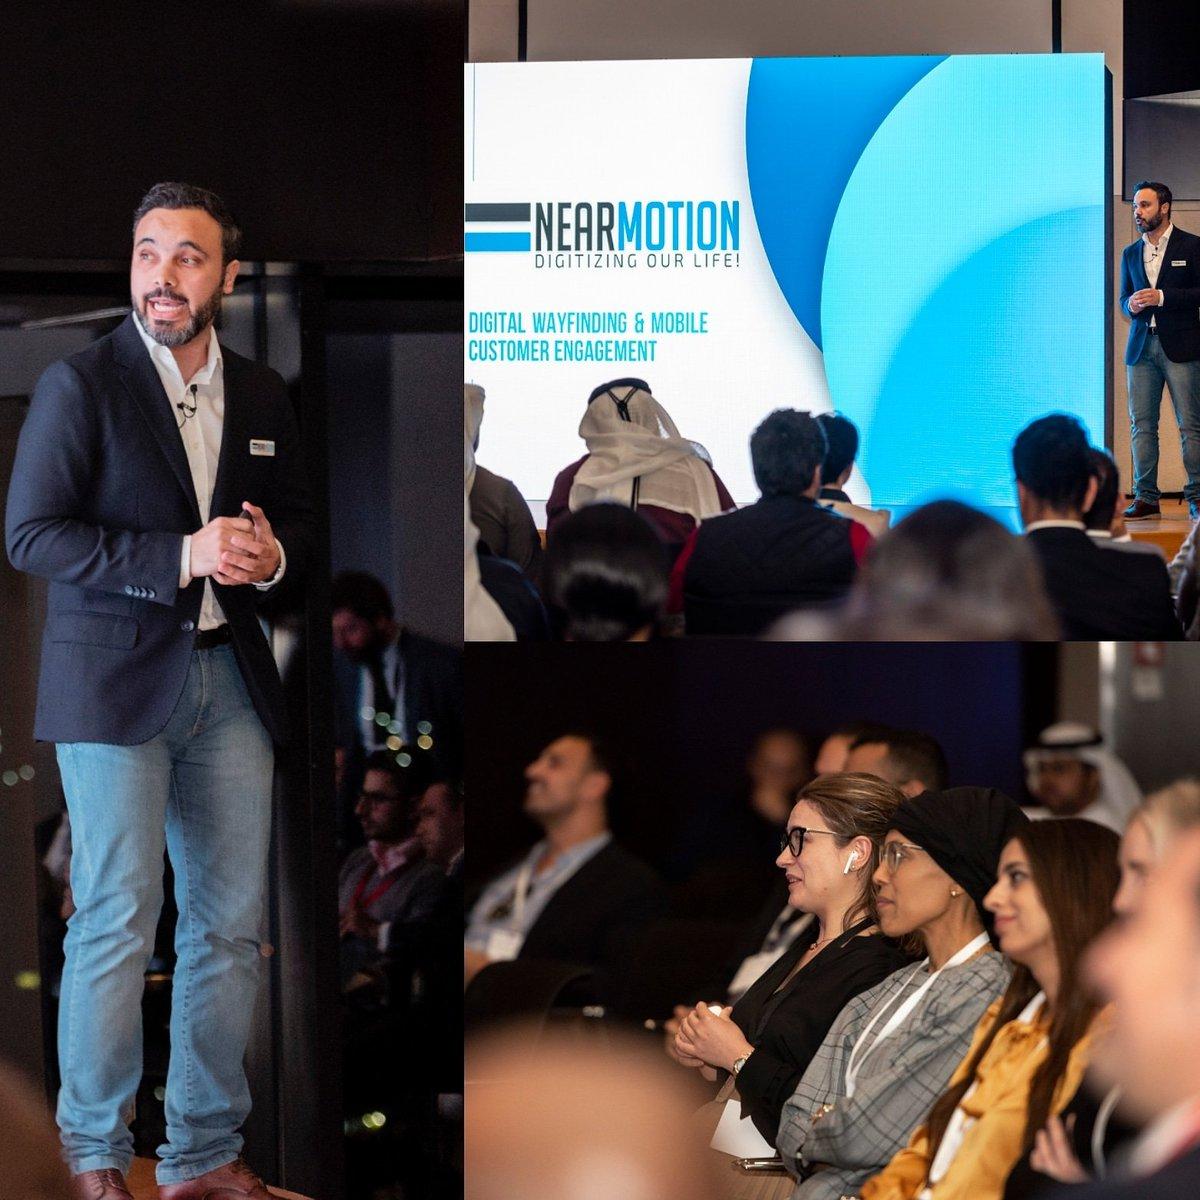 @NEARMOTION presenting on Demo Day as a pround finalist of the @dxb_smartcity @dubaichamber #Dubai #startup #saudiarabia https://t.co/QXXJSywWKc